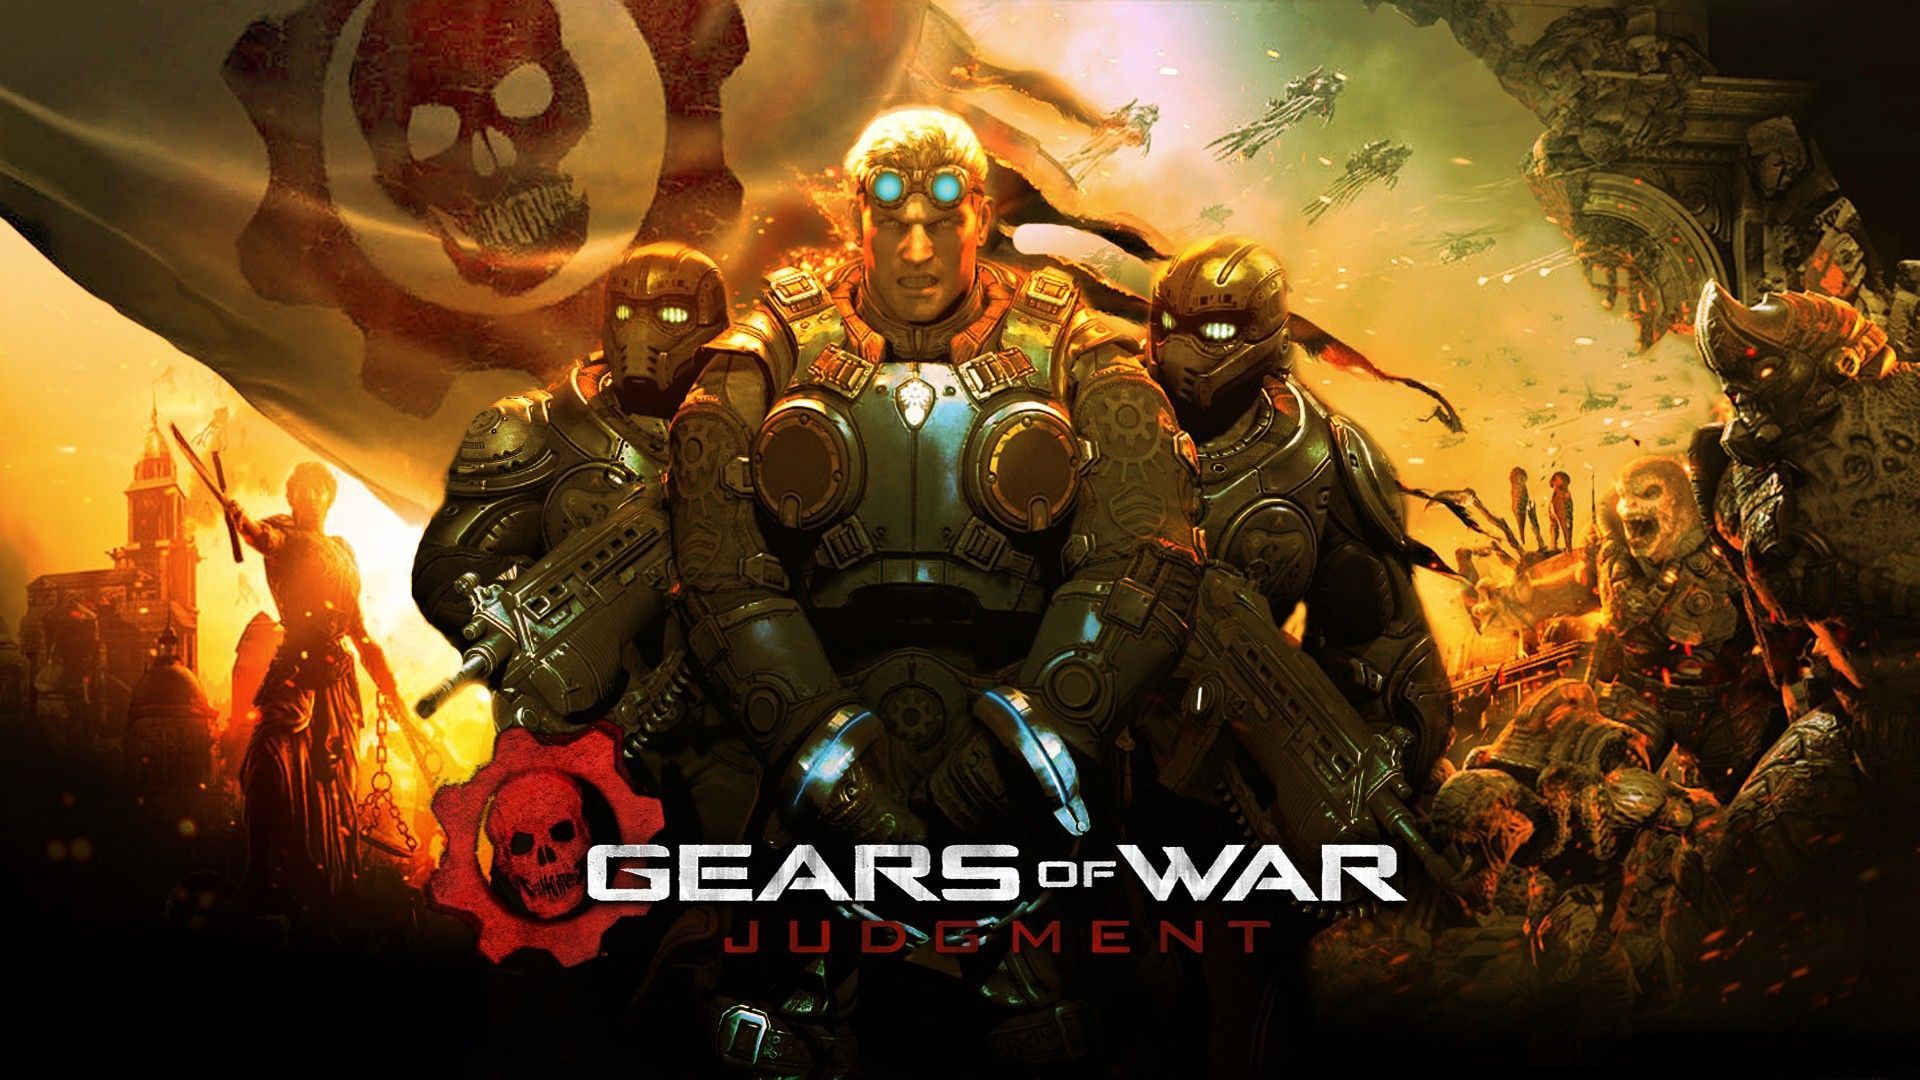 Video Games Gears Of War Wallpaper Gears Of War Gears Of War Judgment Gears Of War 2